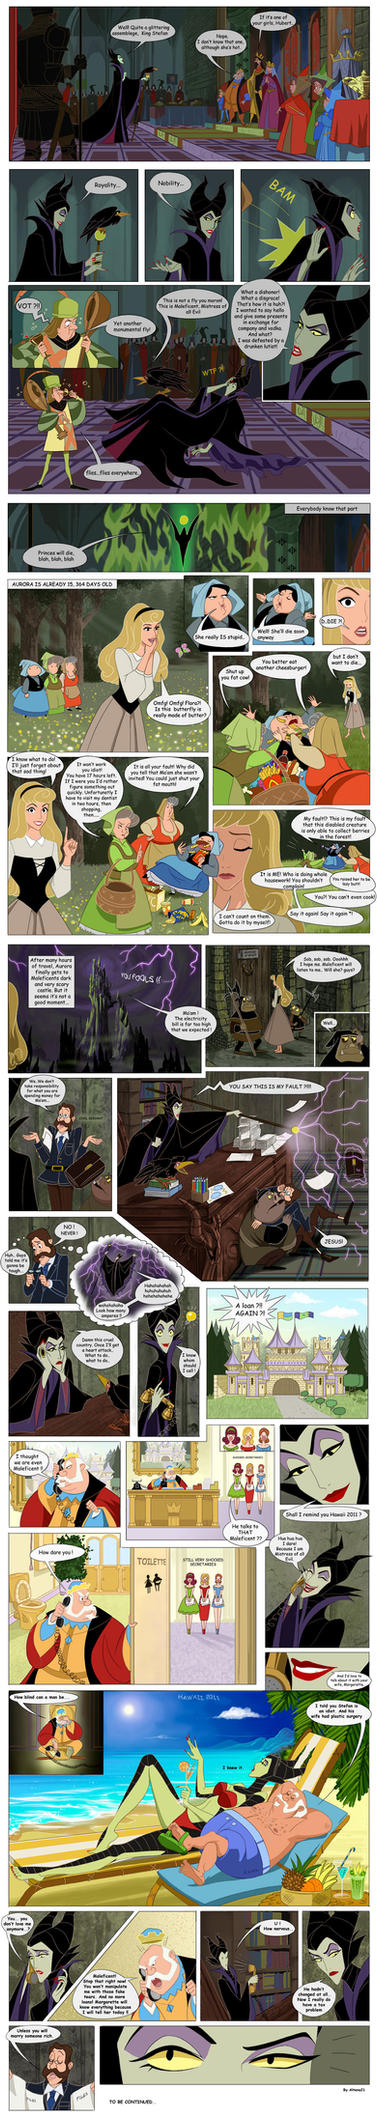 Maleficent true story #1 by Precia-T